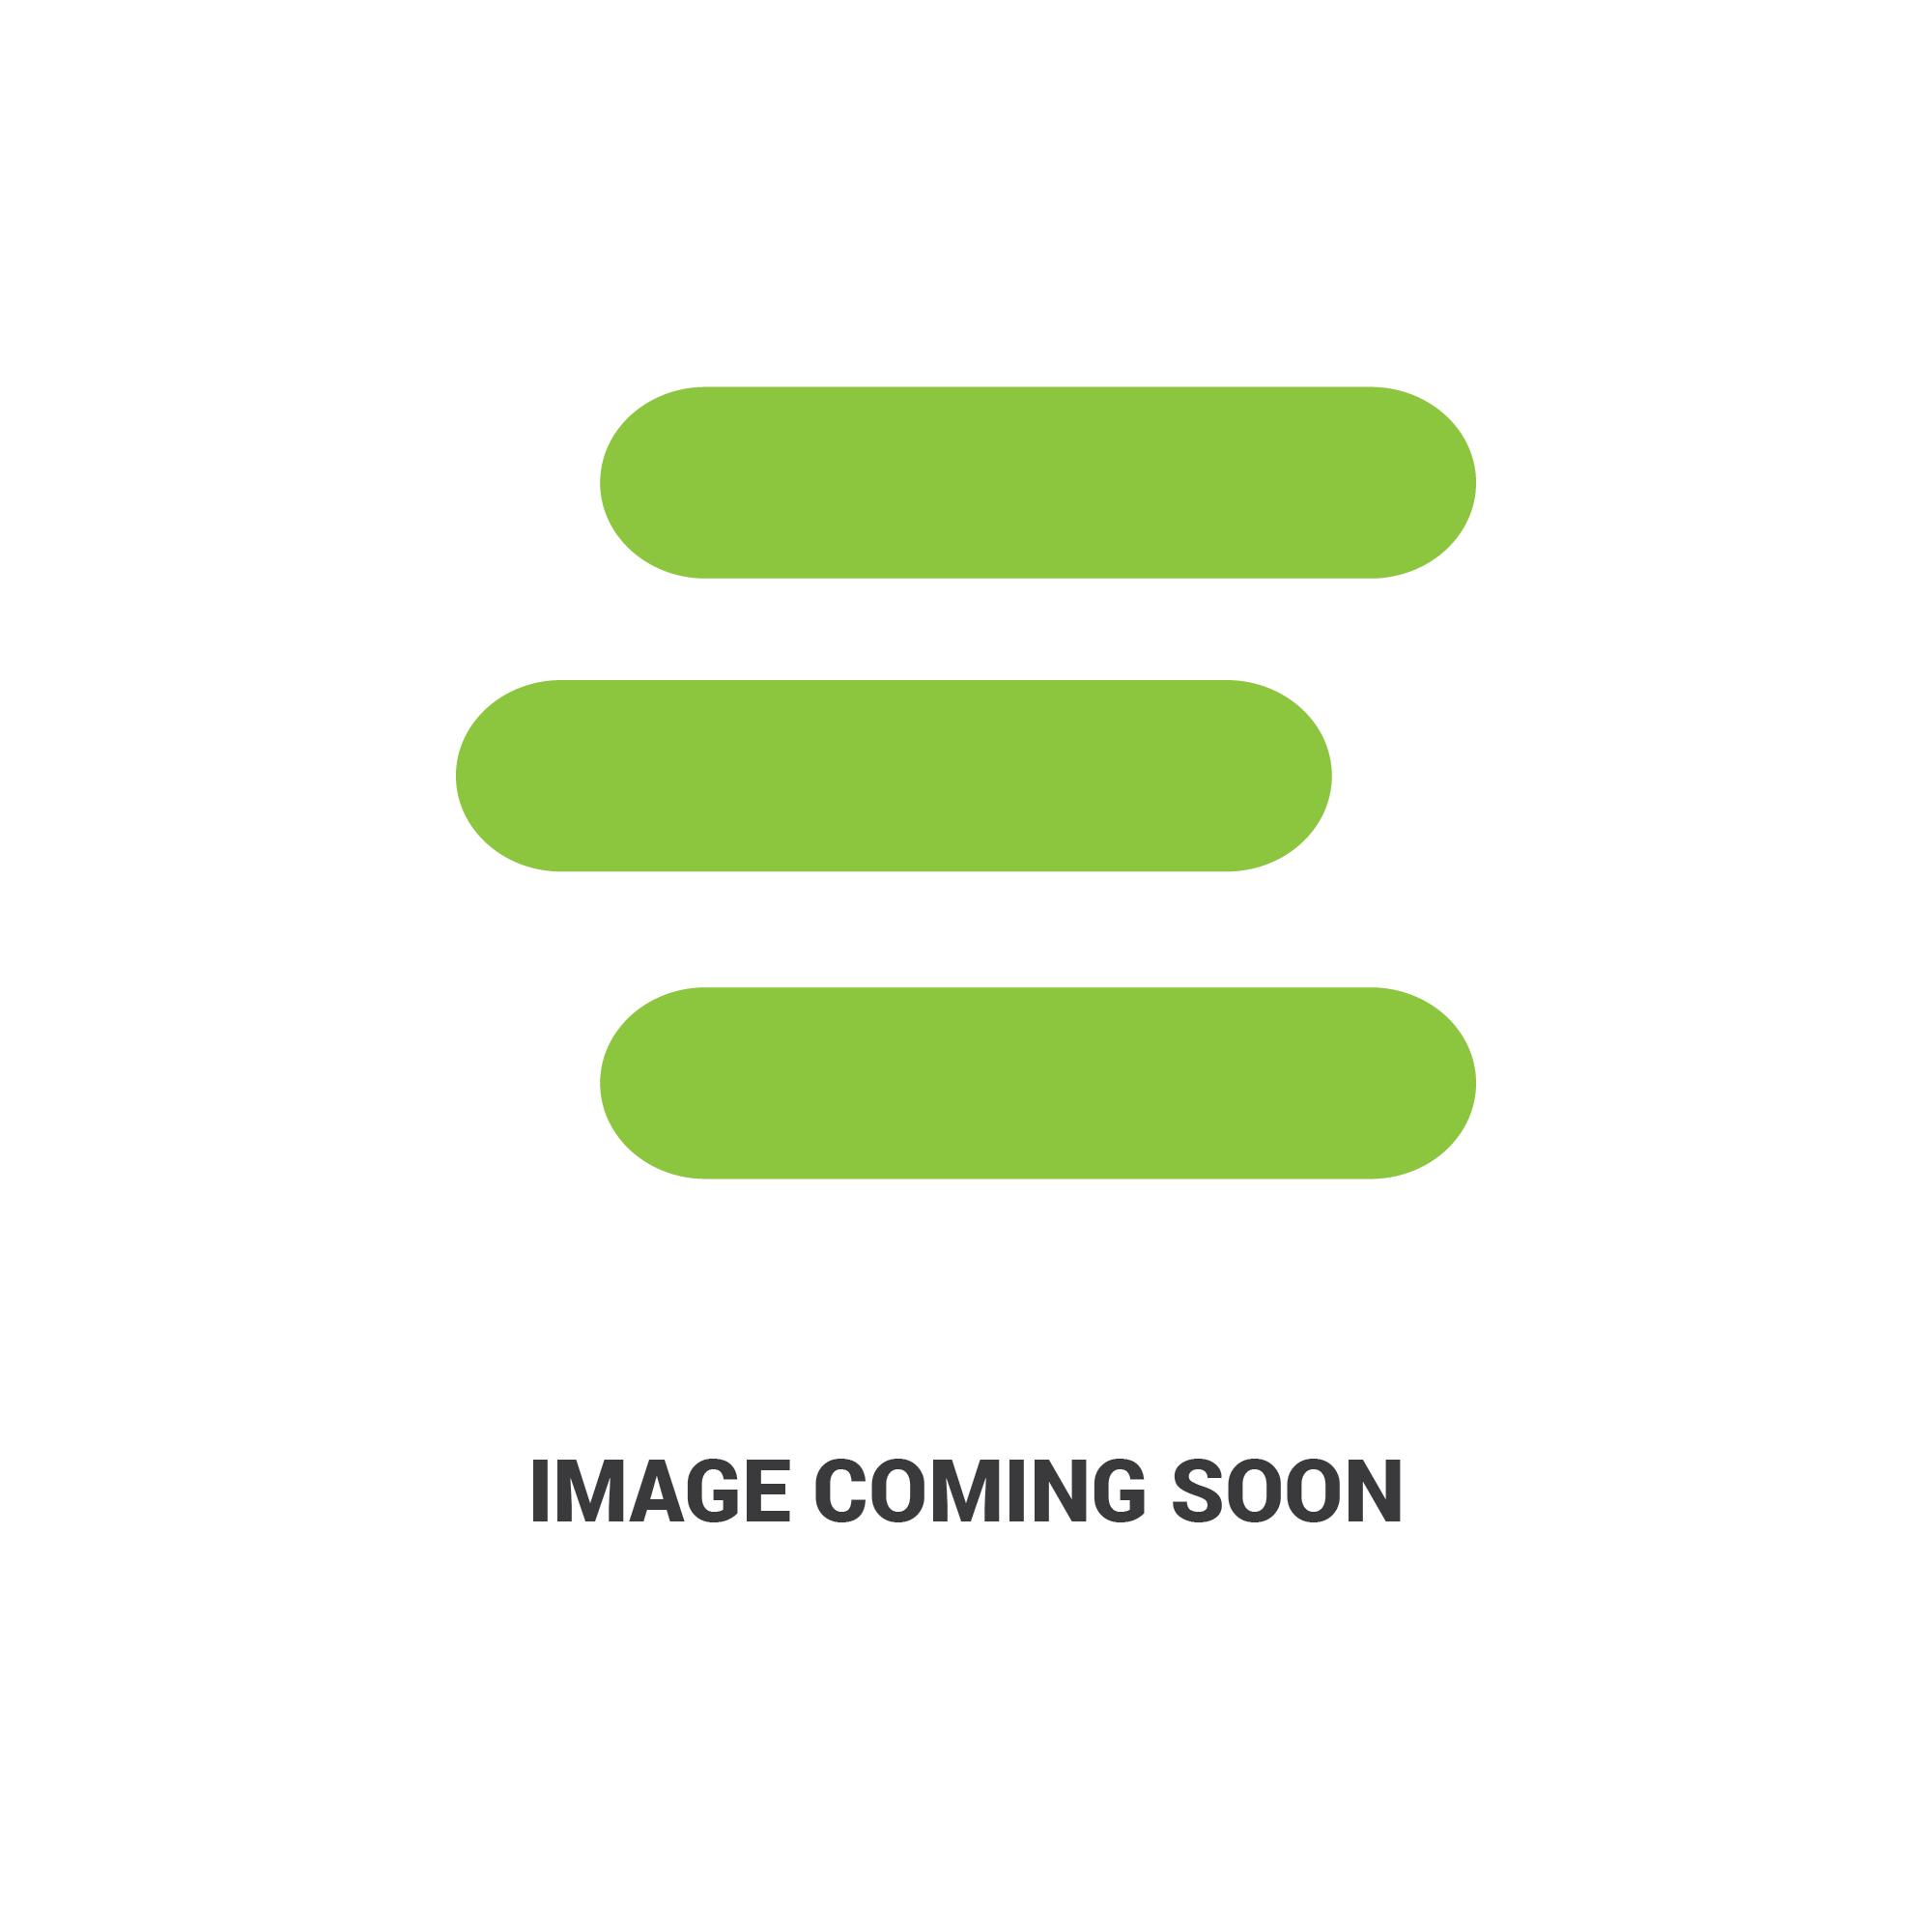 E-5120399edit 1.jpg